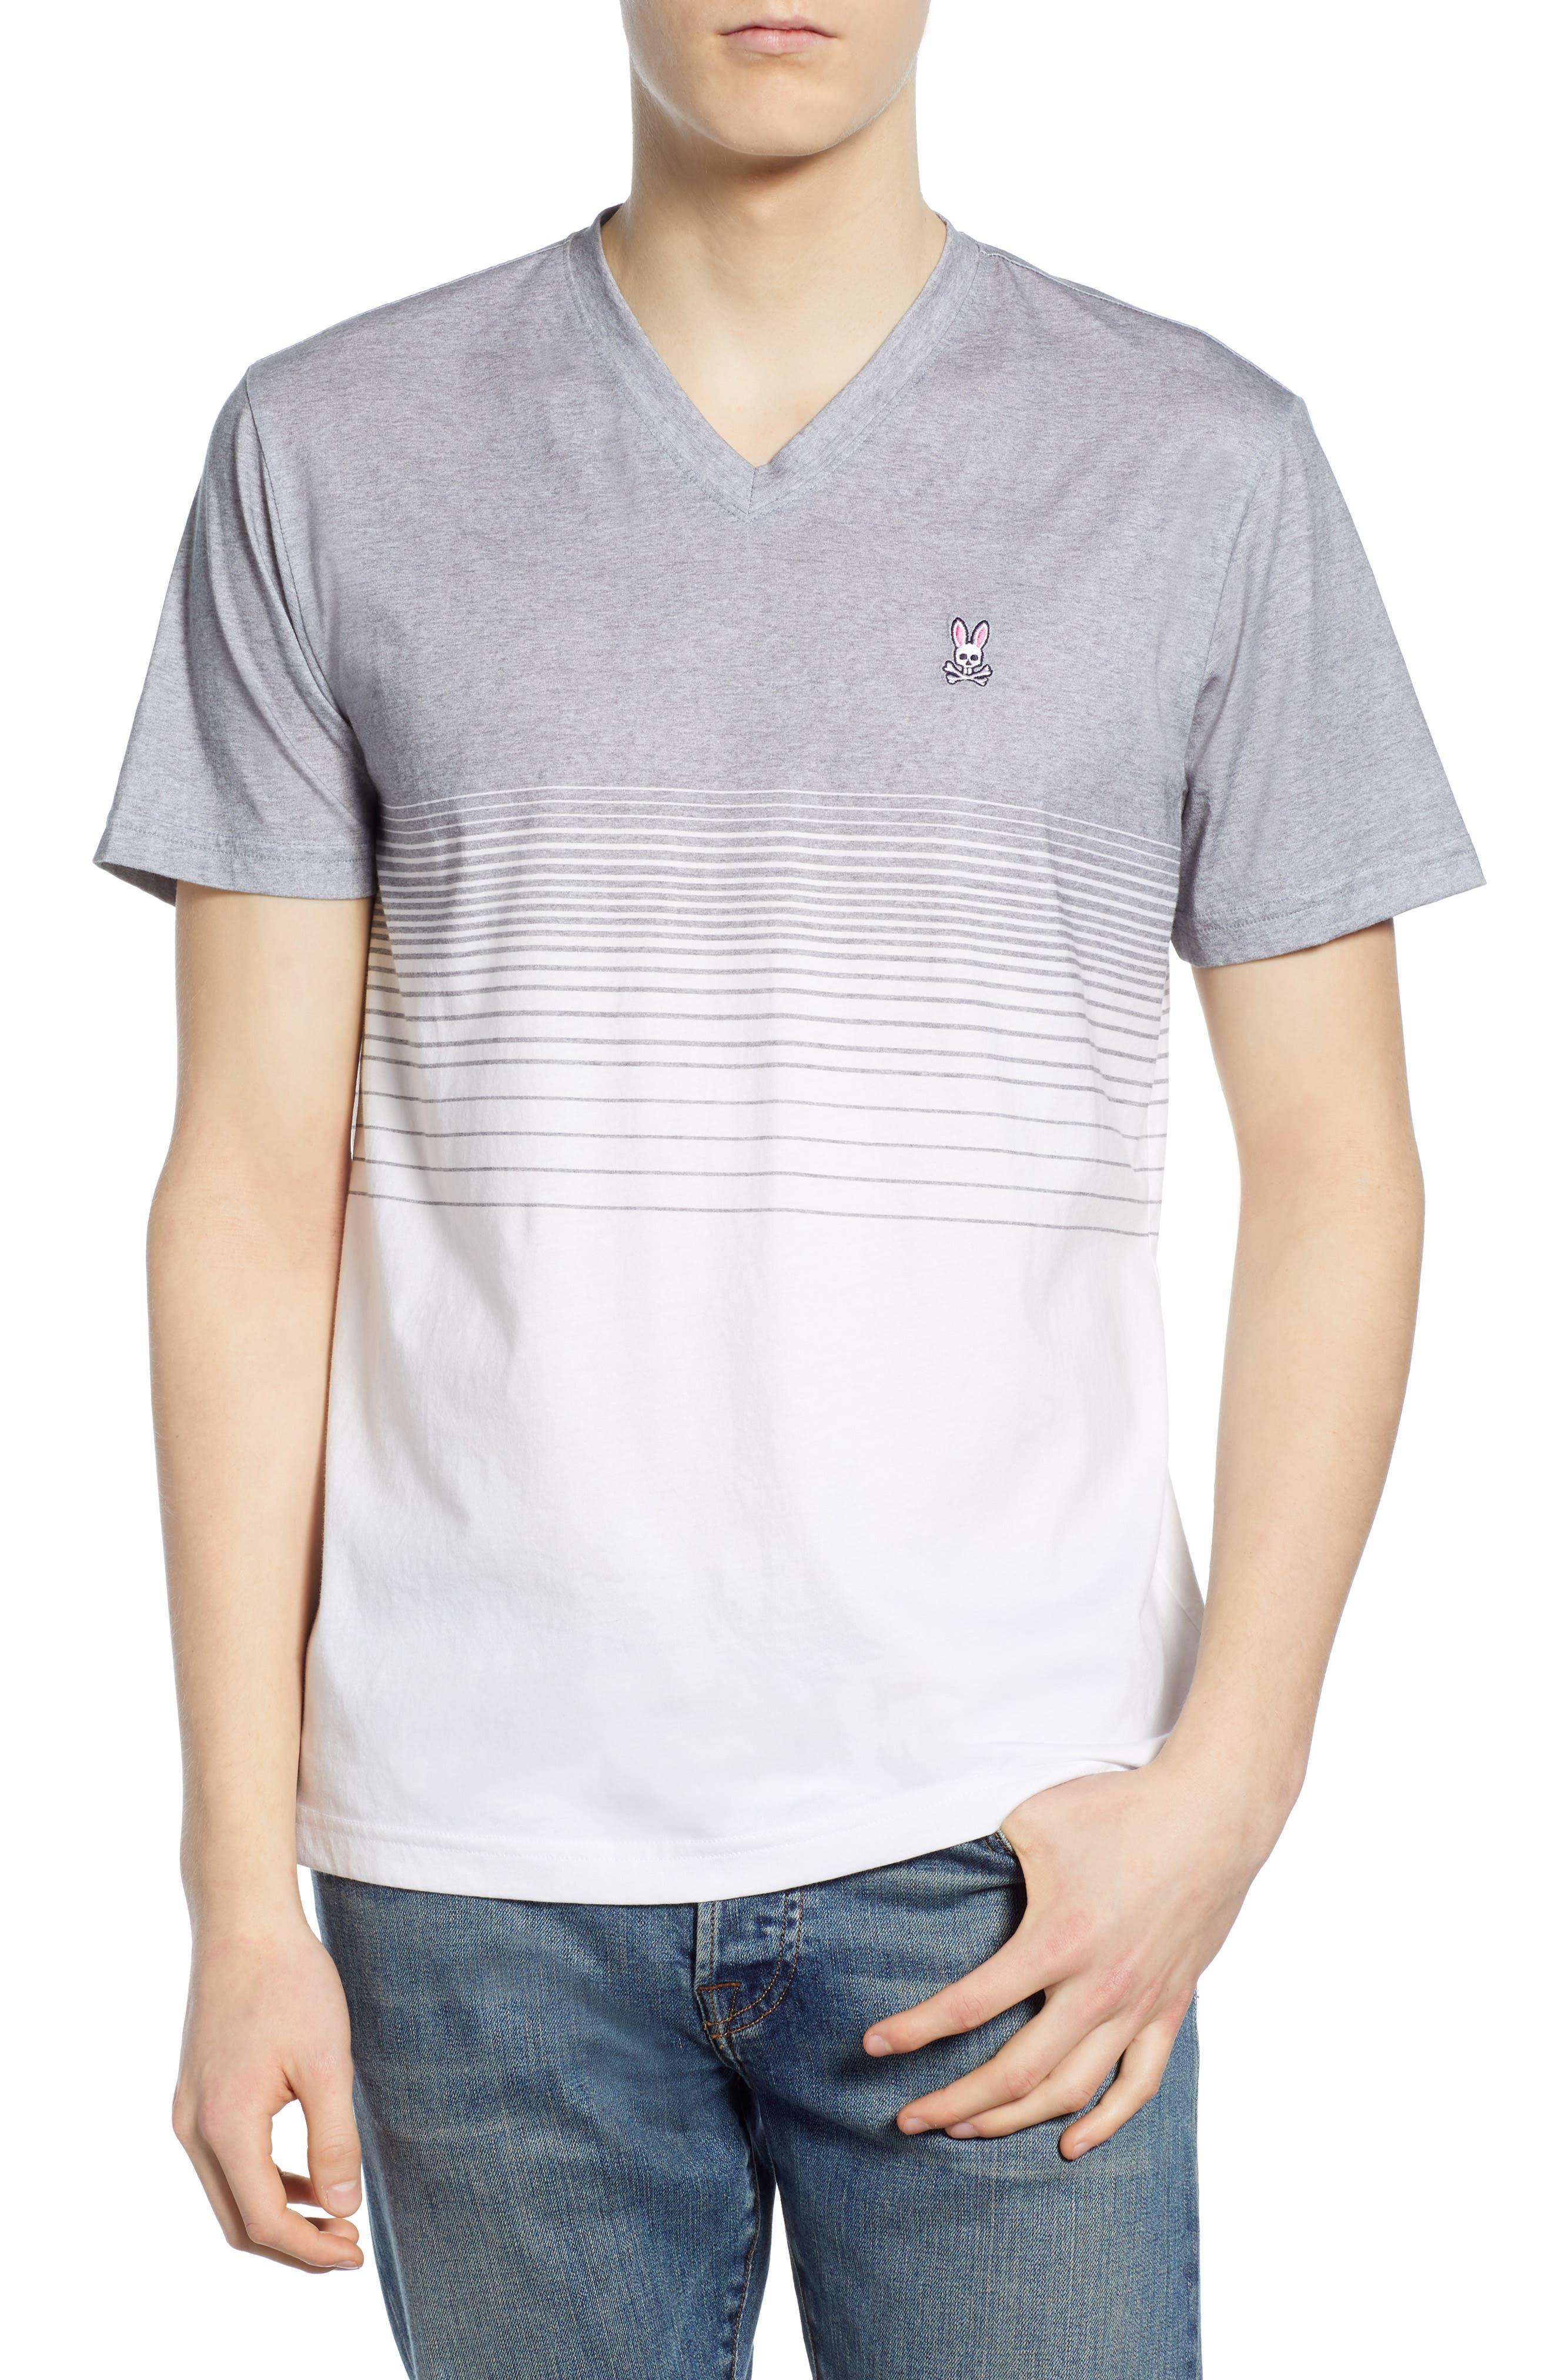 395137a1662 Men s Psycho Bunny V-Neck T-Shirts